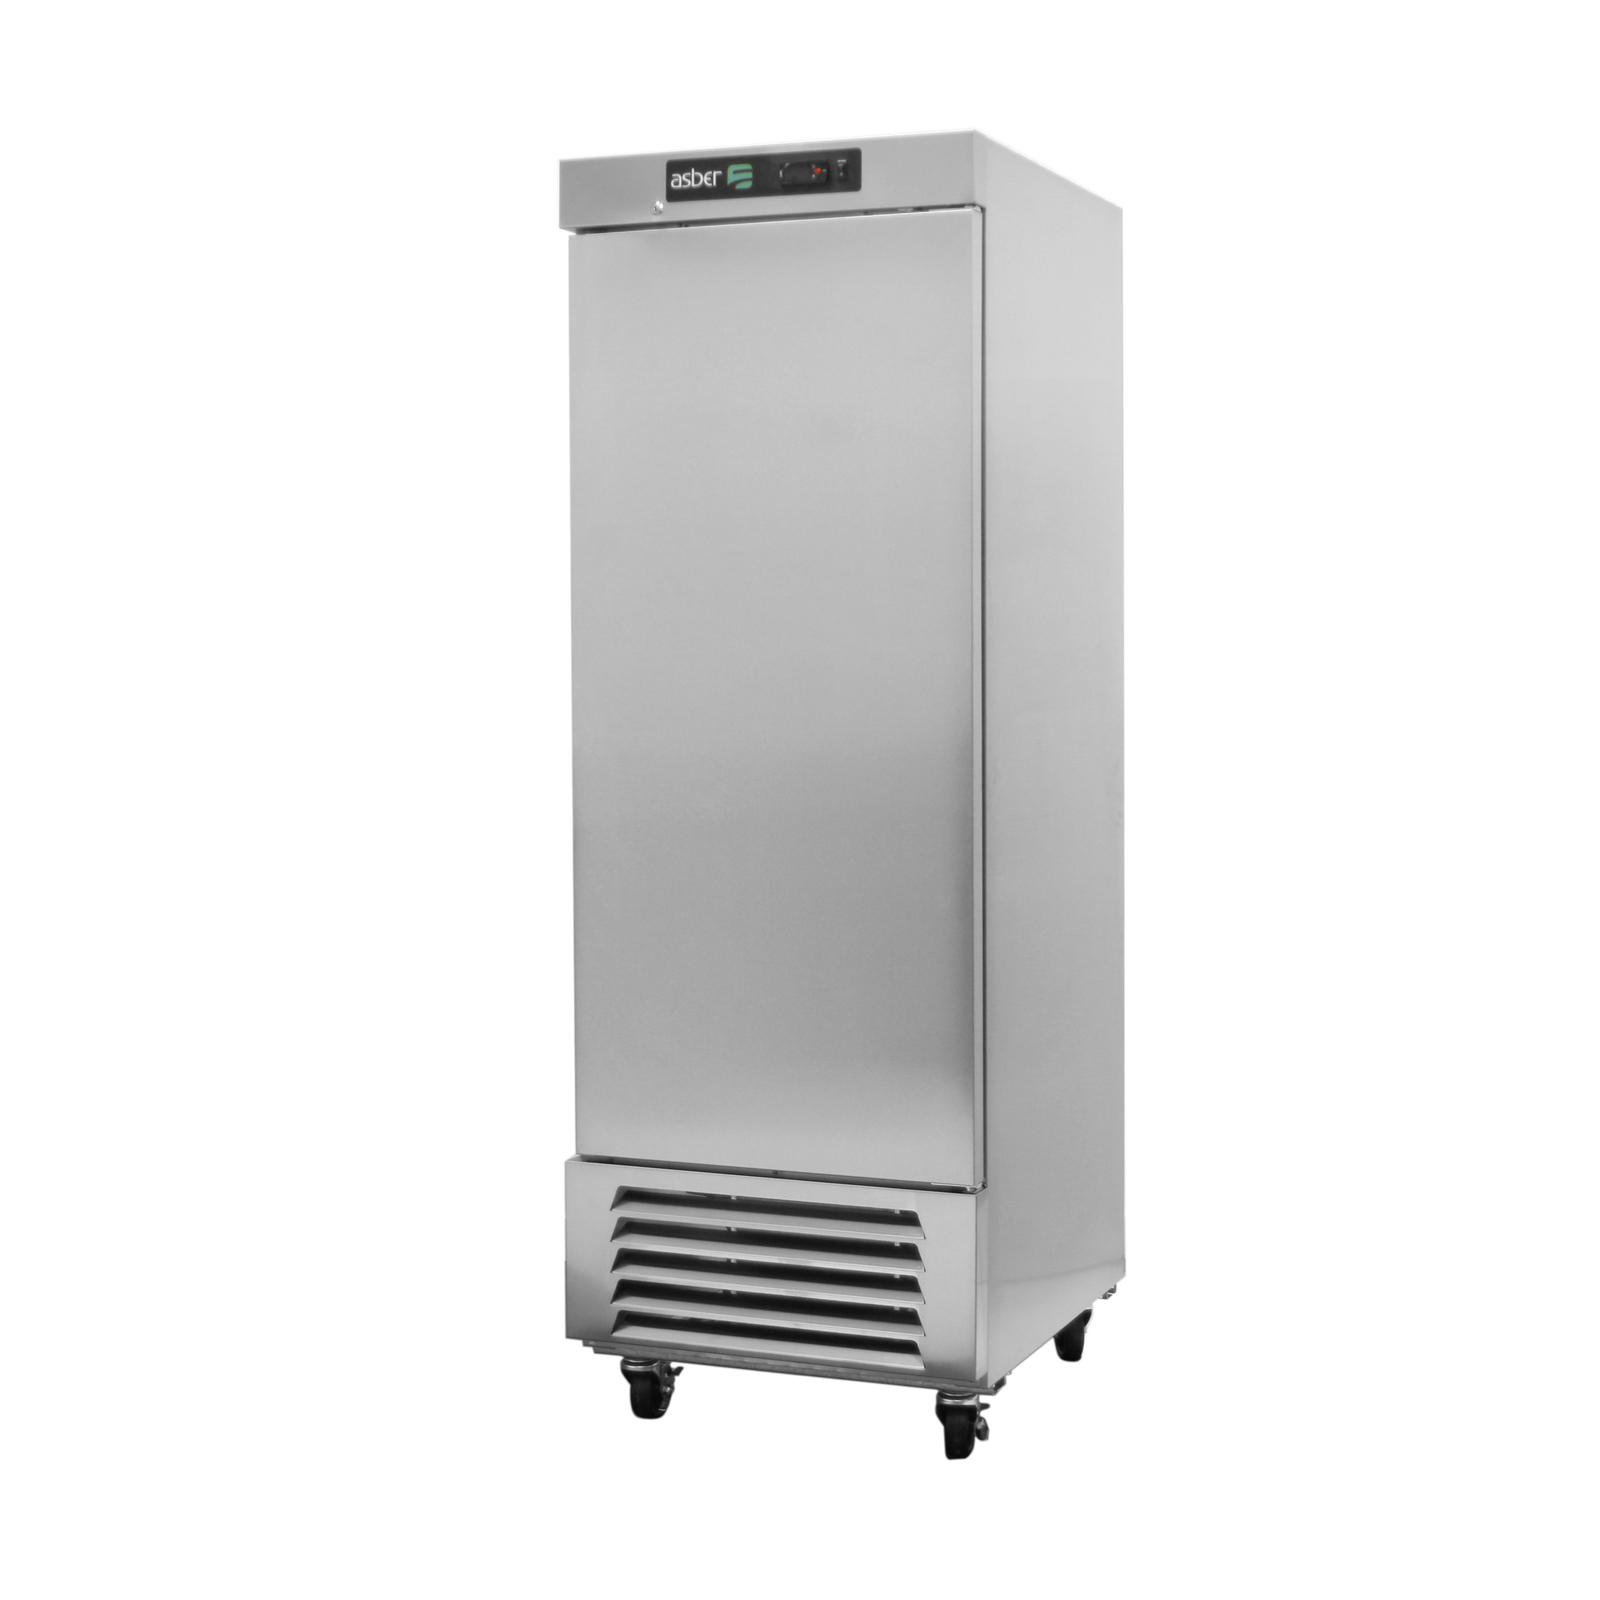 ARR-23 Asber refrigerator, reach-in